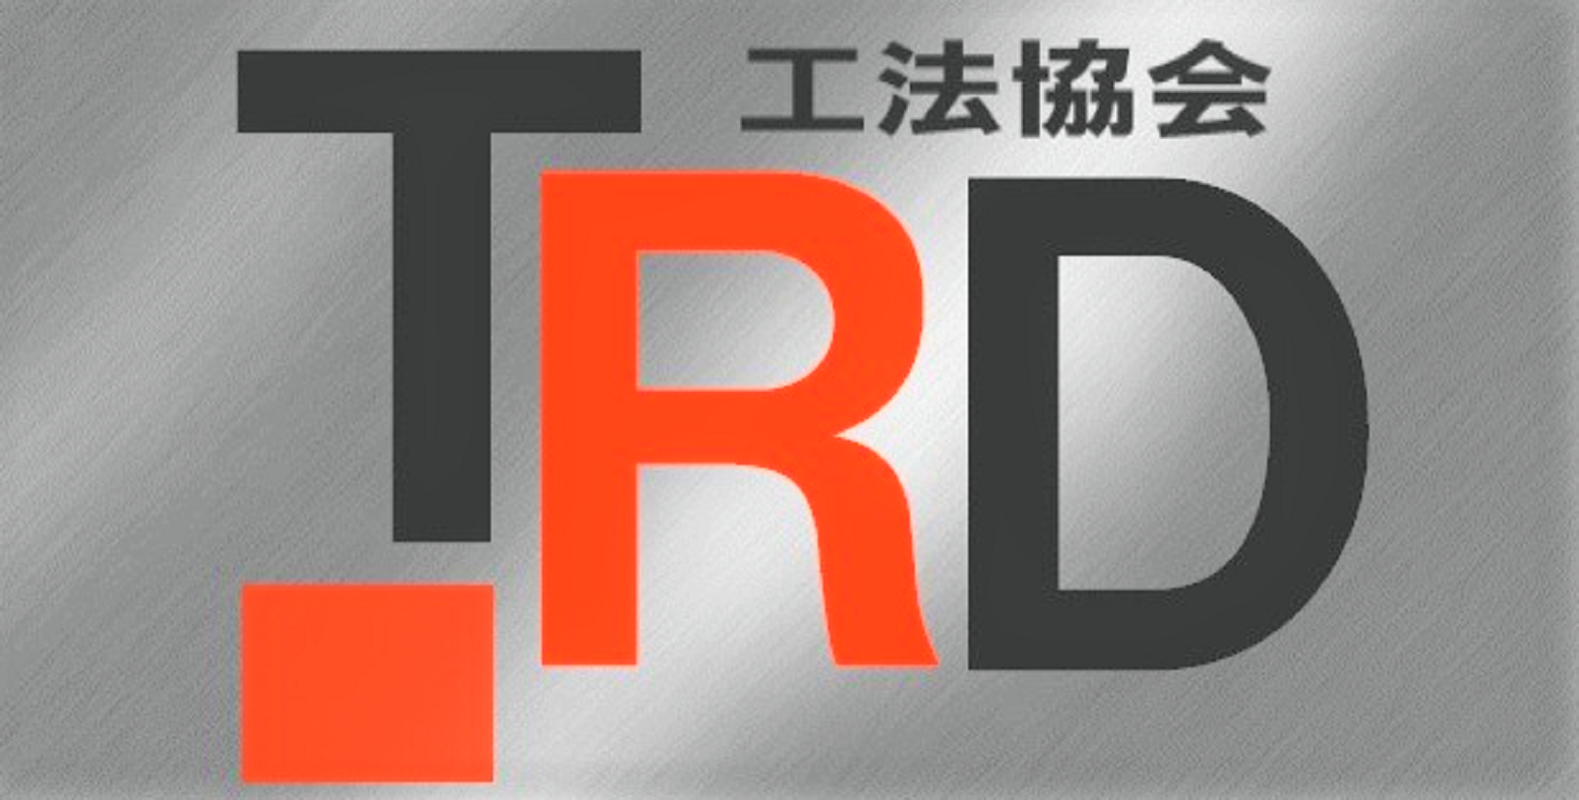 TRD Association